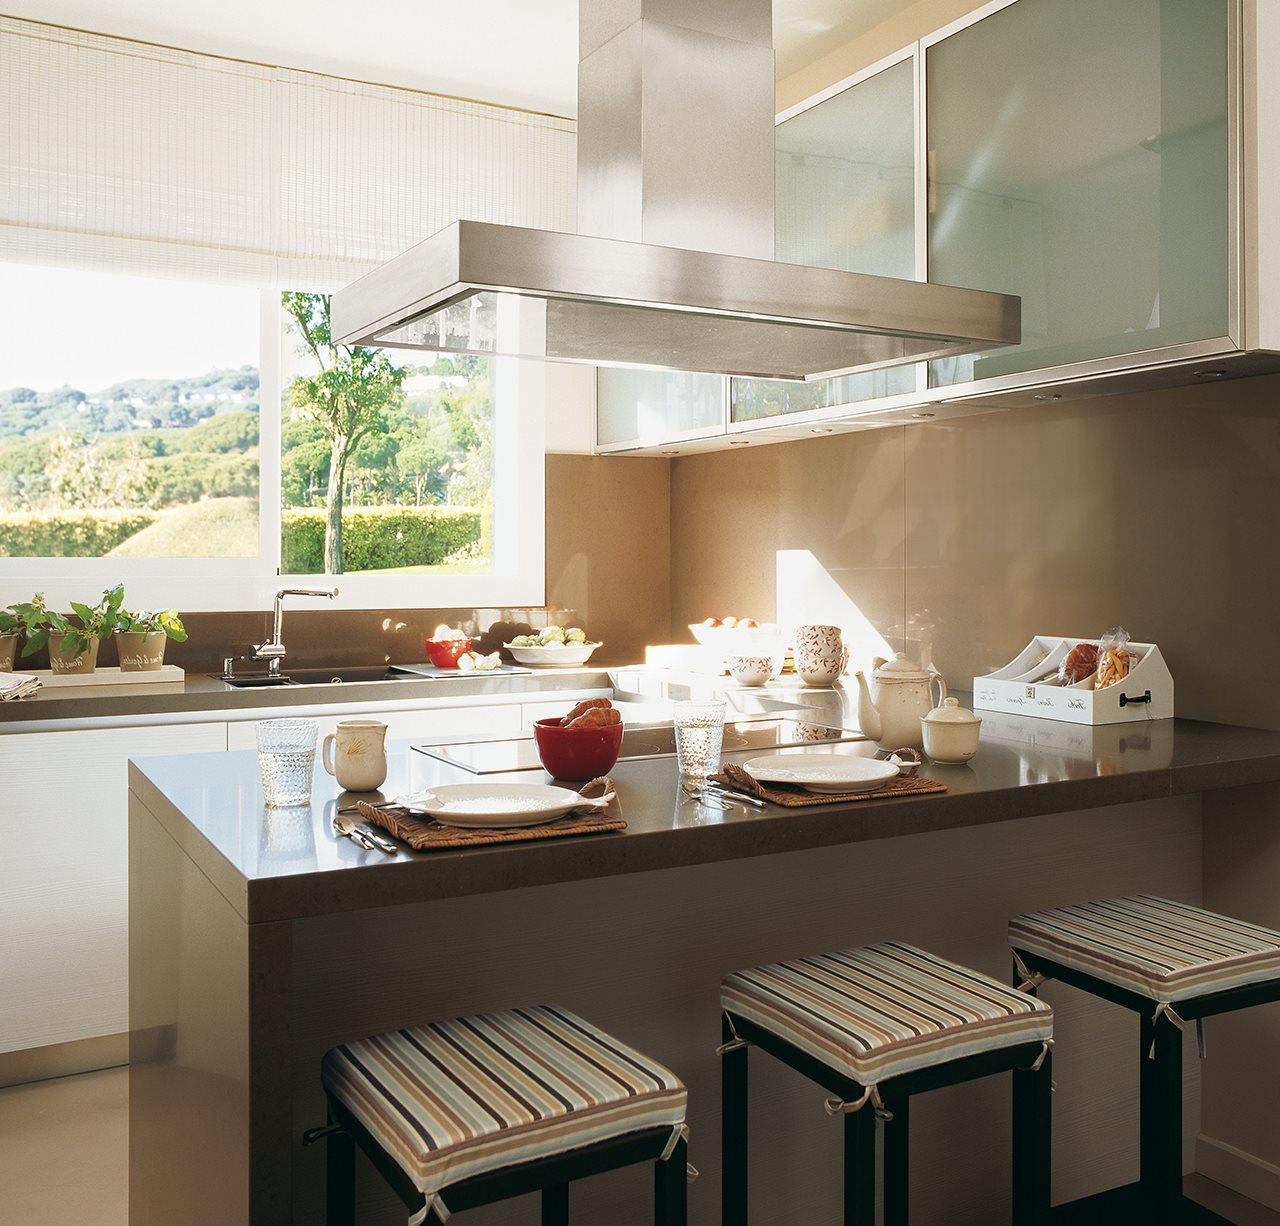 Los 9 mejores dise os de cocinas office for Diseno cocinas paralelo